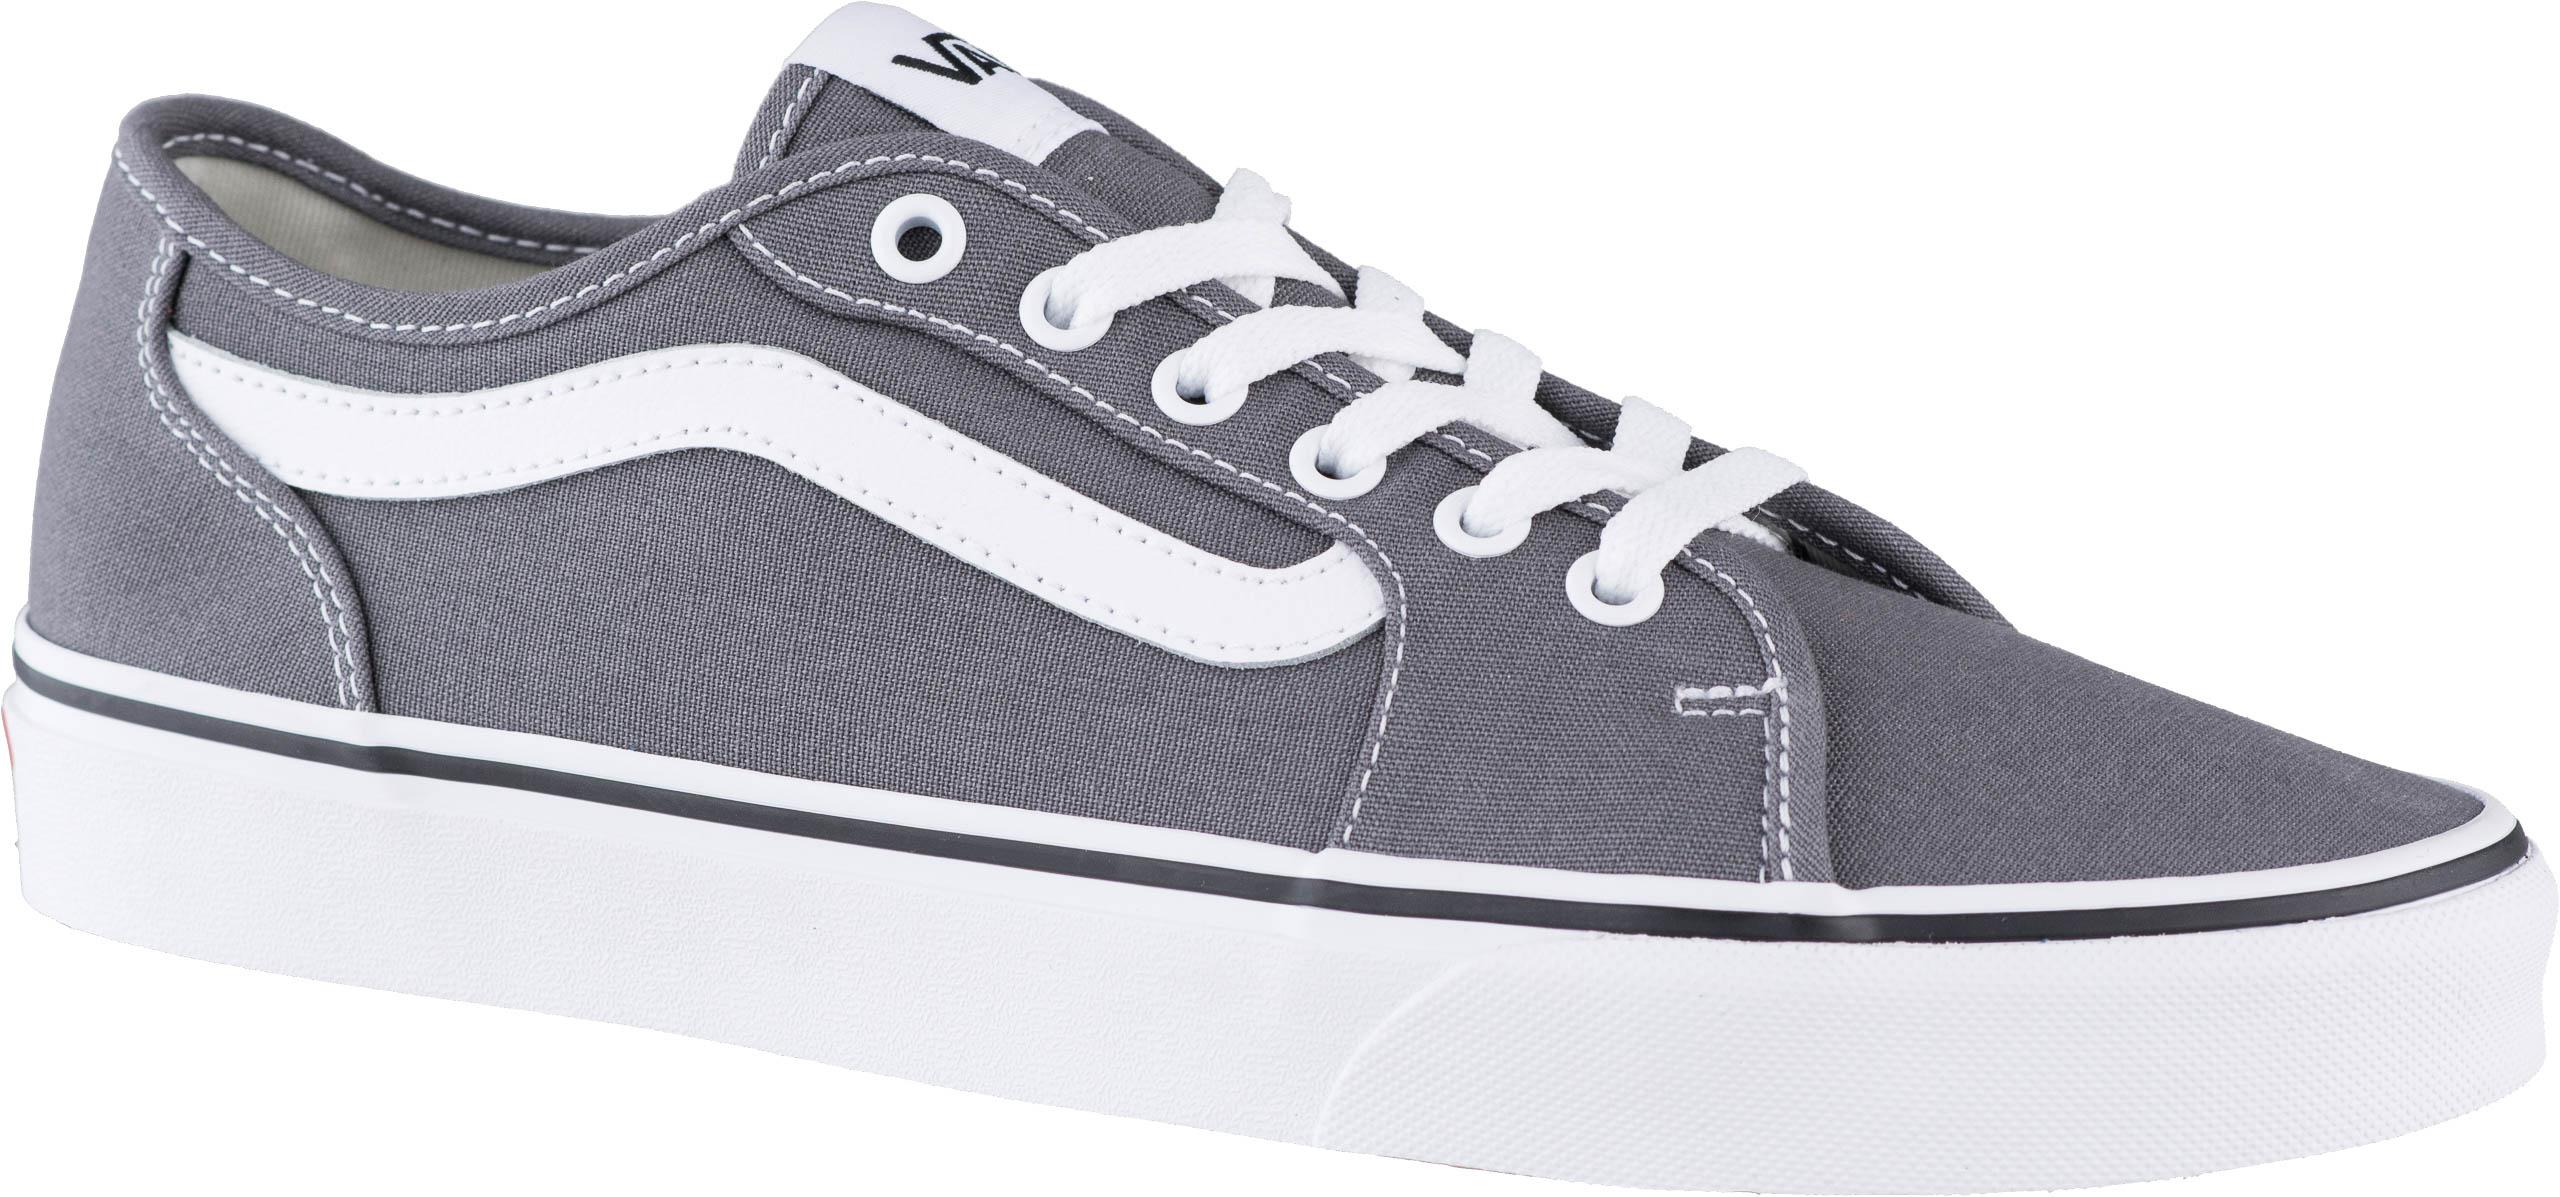 VANS Filmore Decon Sneaker pewterwhite